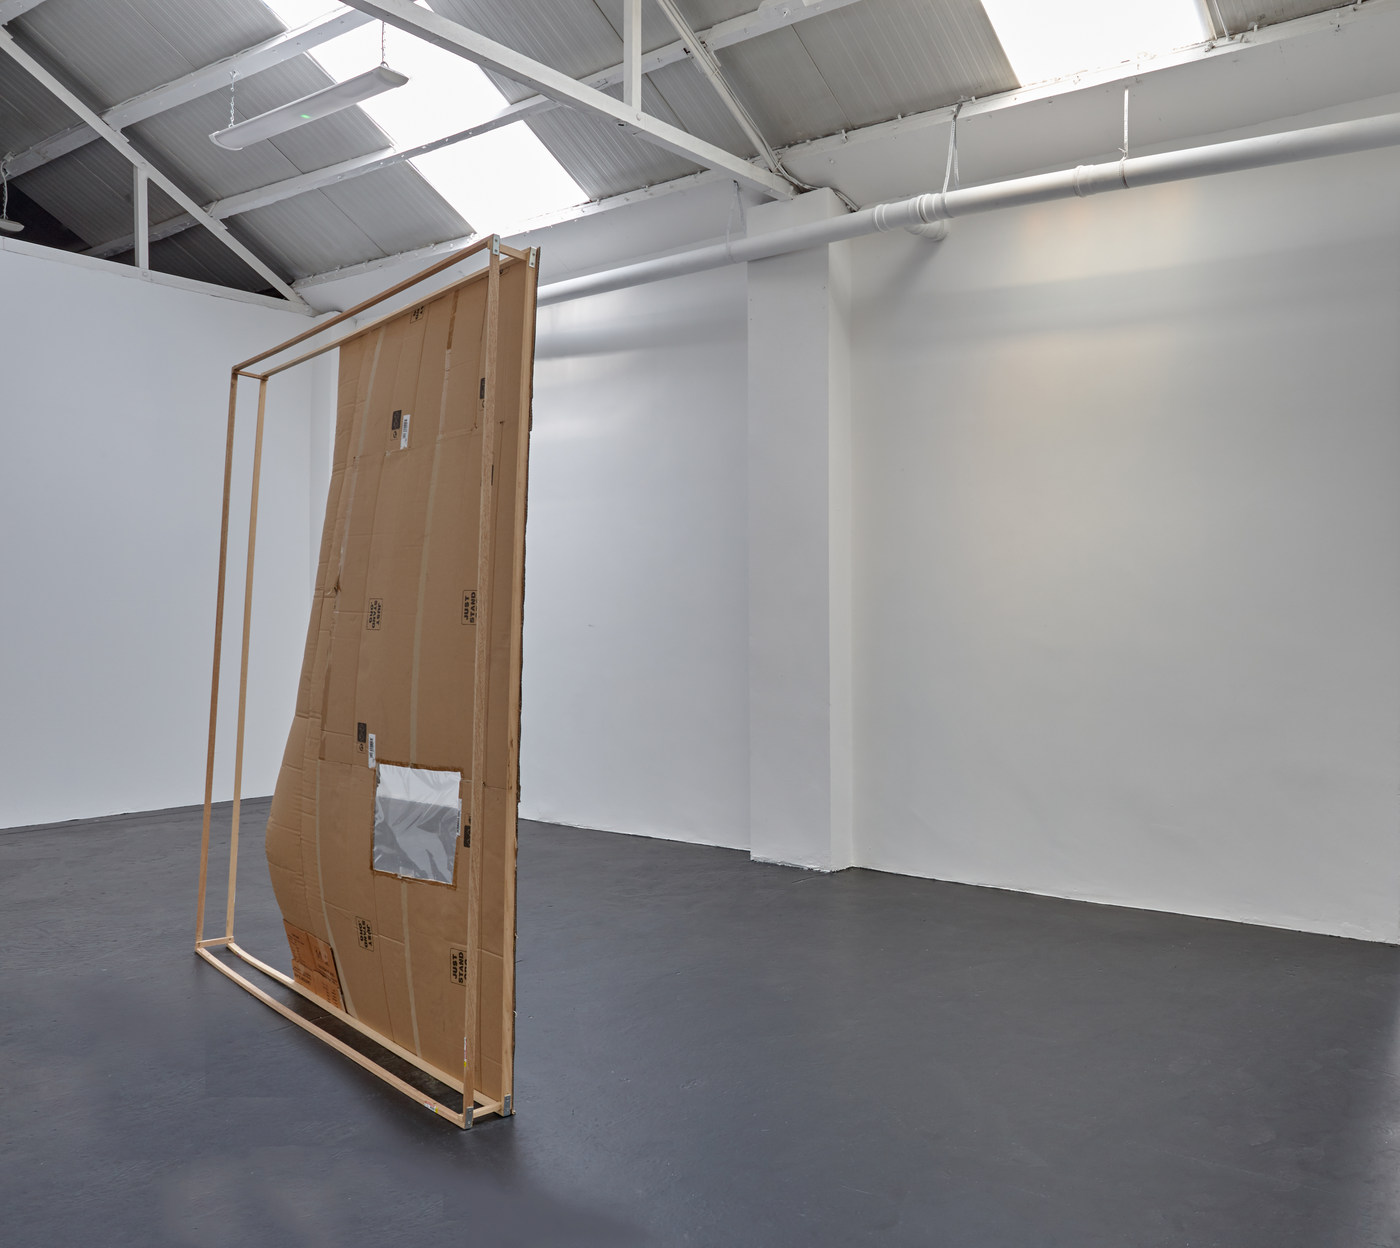 01. Bernhard Hegglin - Bar de Ligne - Installation View I